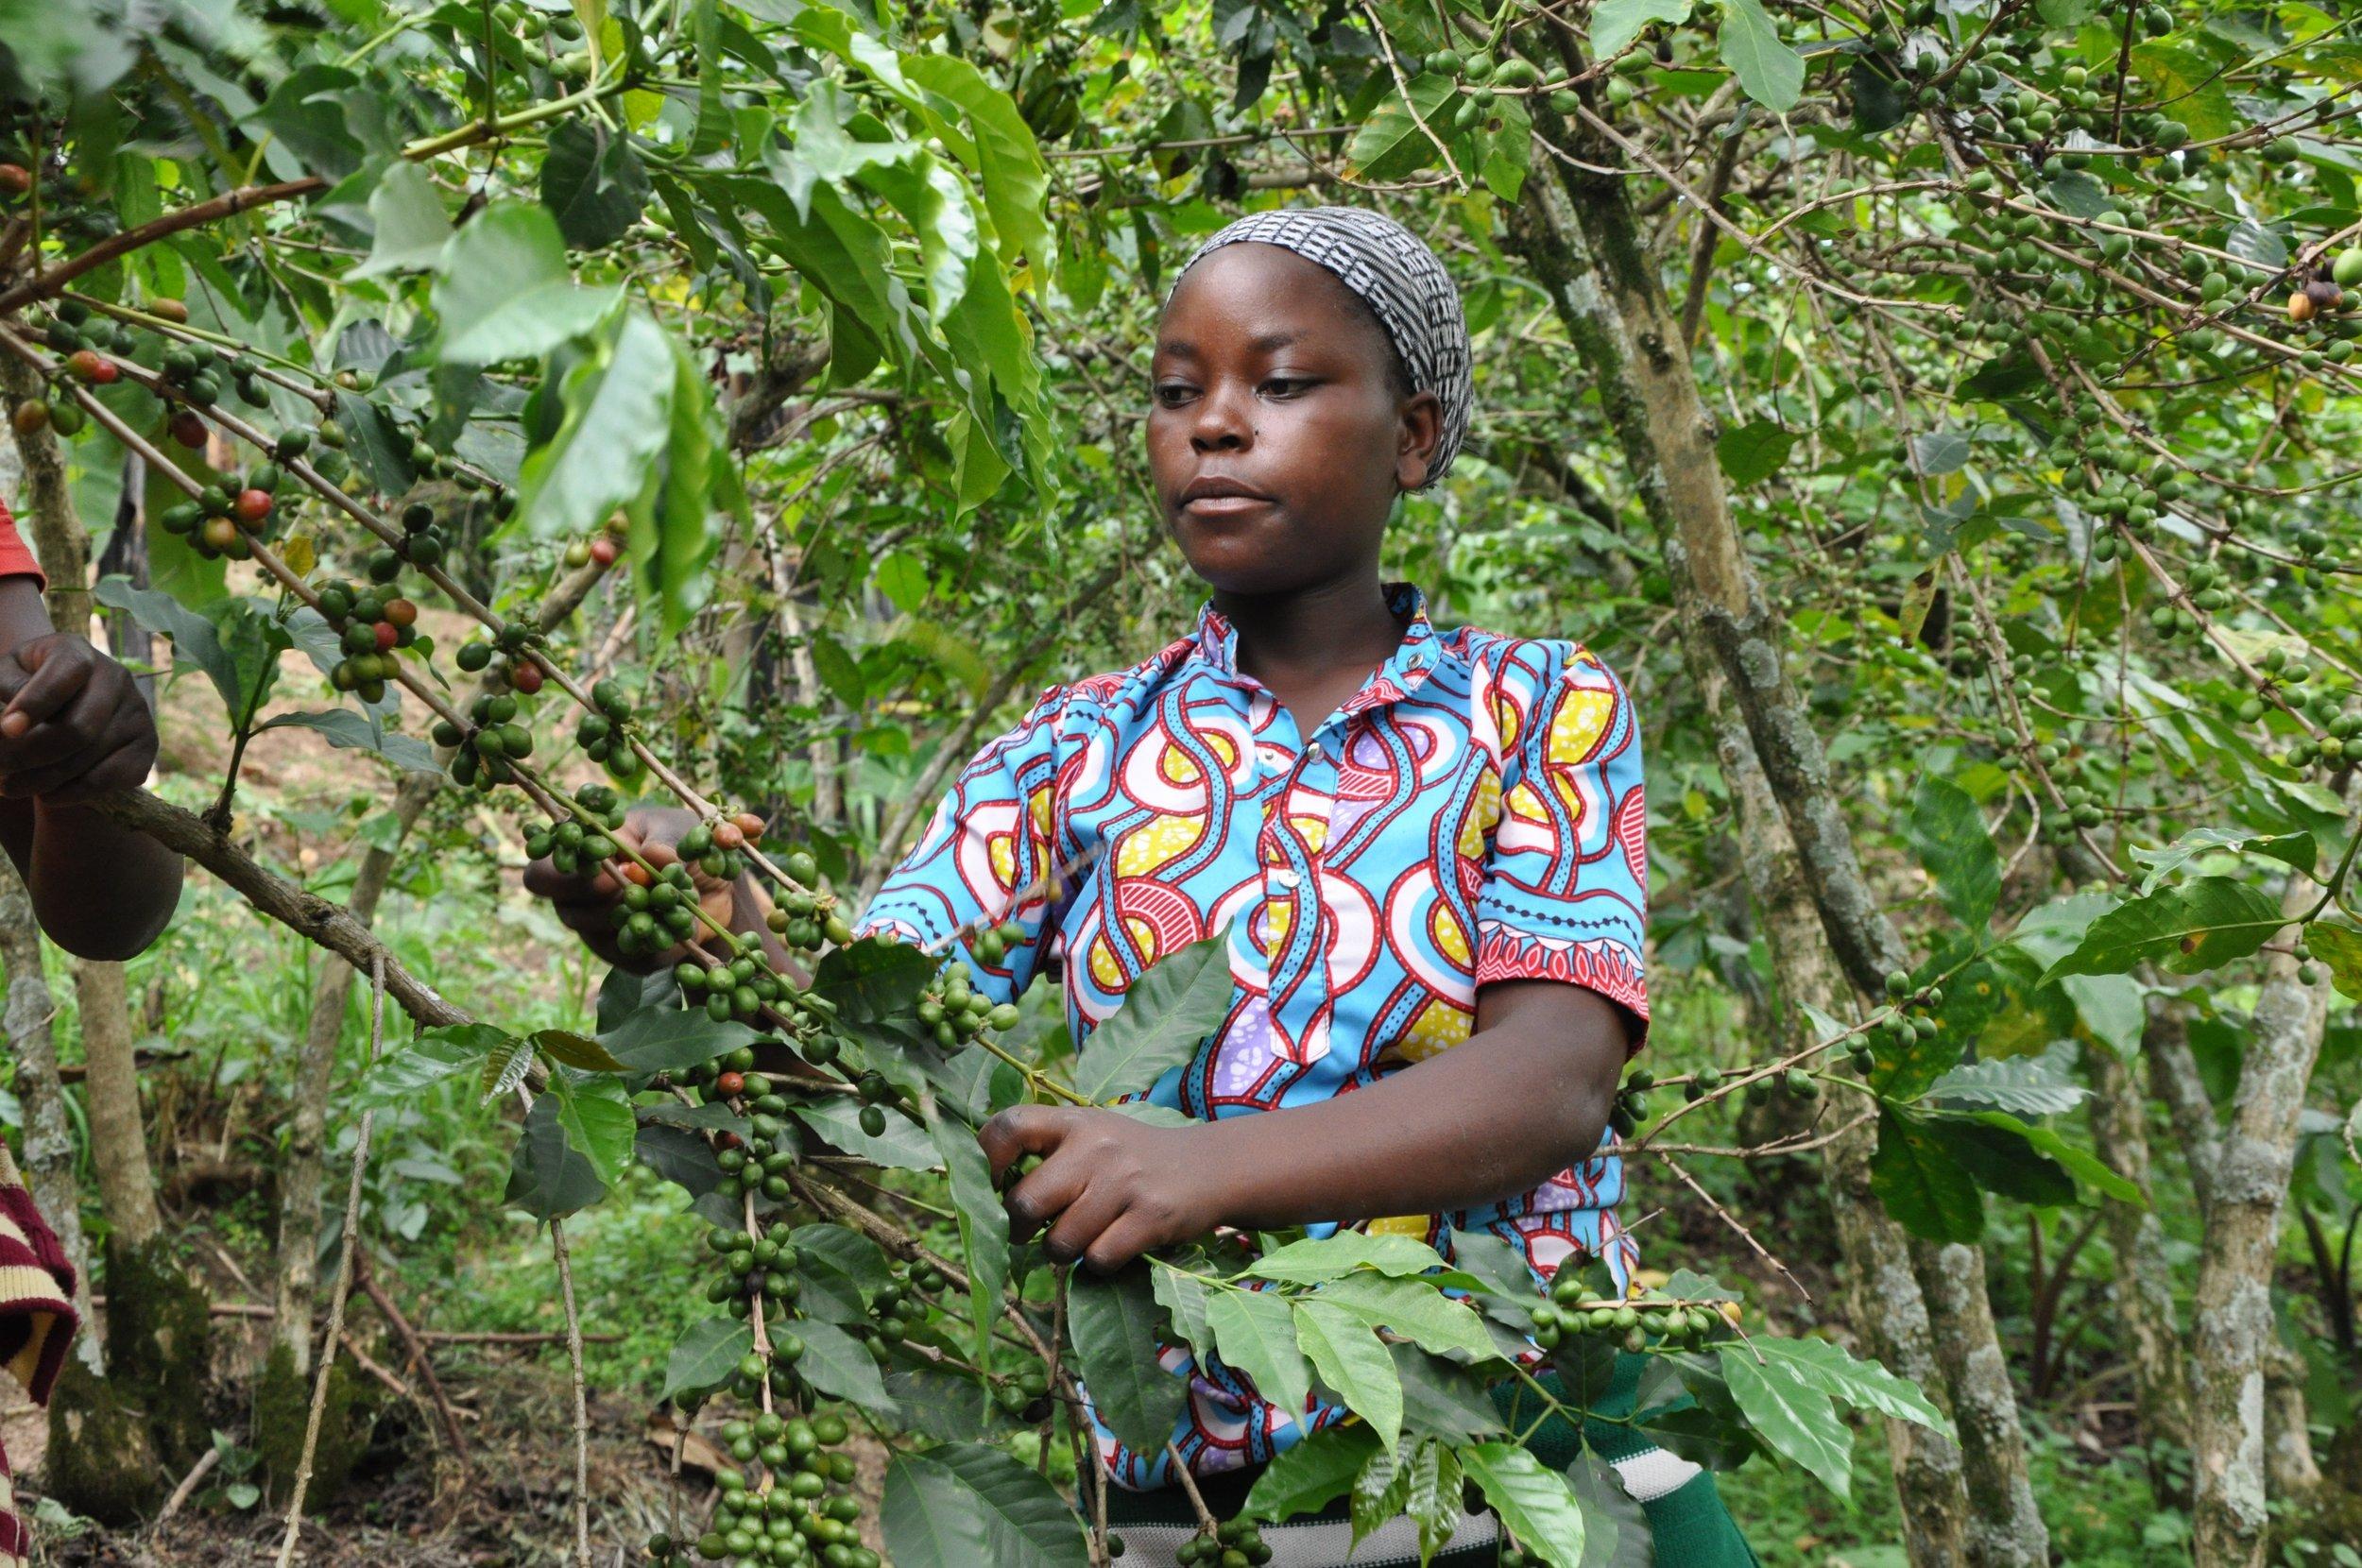 MEMENTO_RWANDA RENAISSANCE_Eric Turpin_7_Coffee plantation cuilleuse.jpg